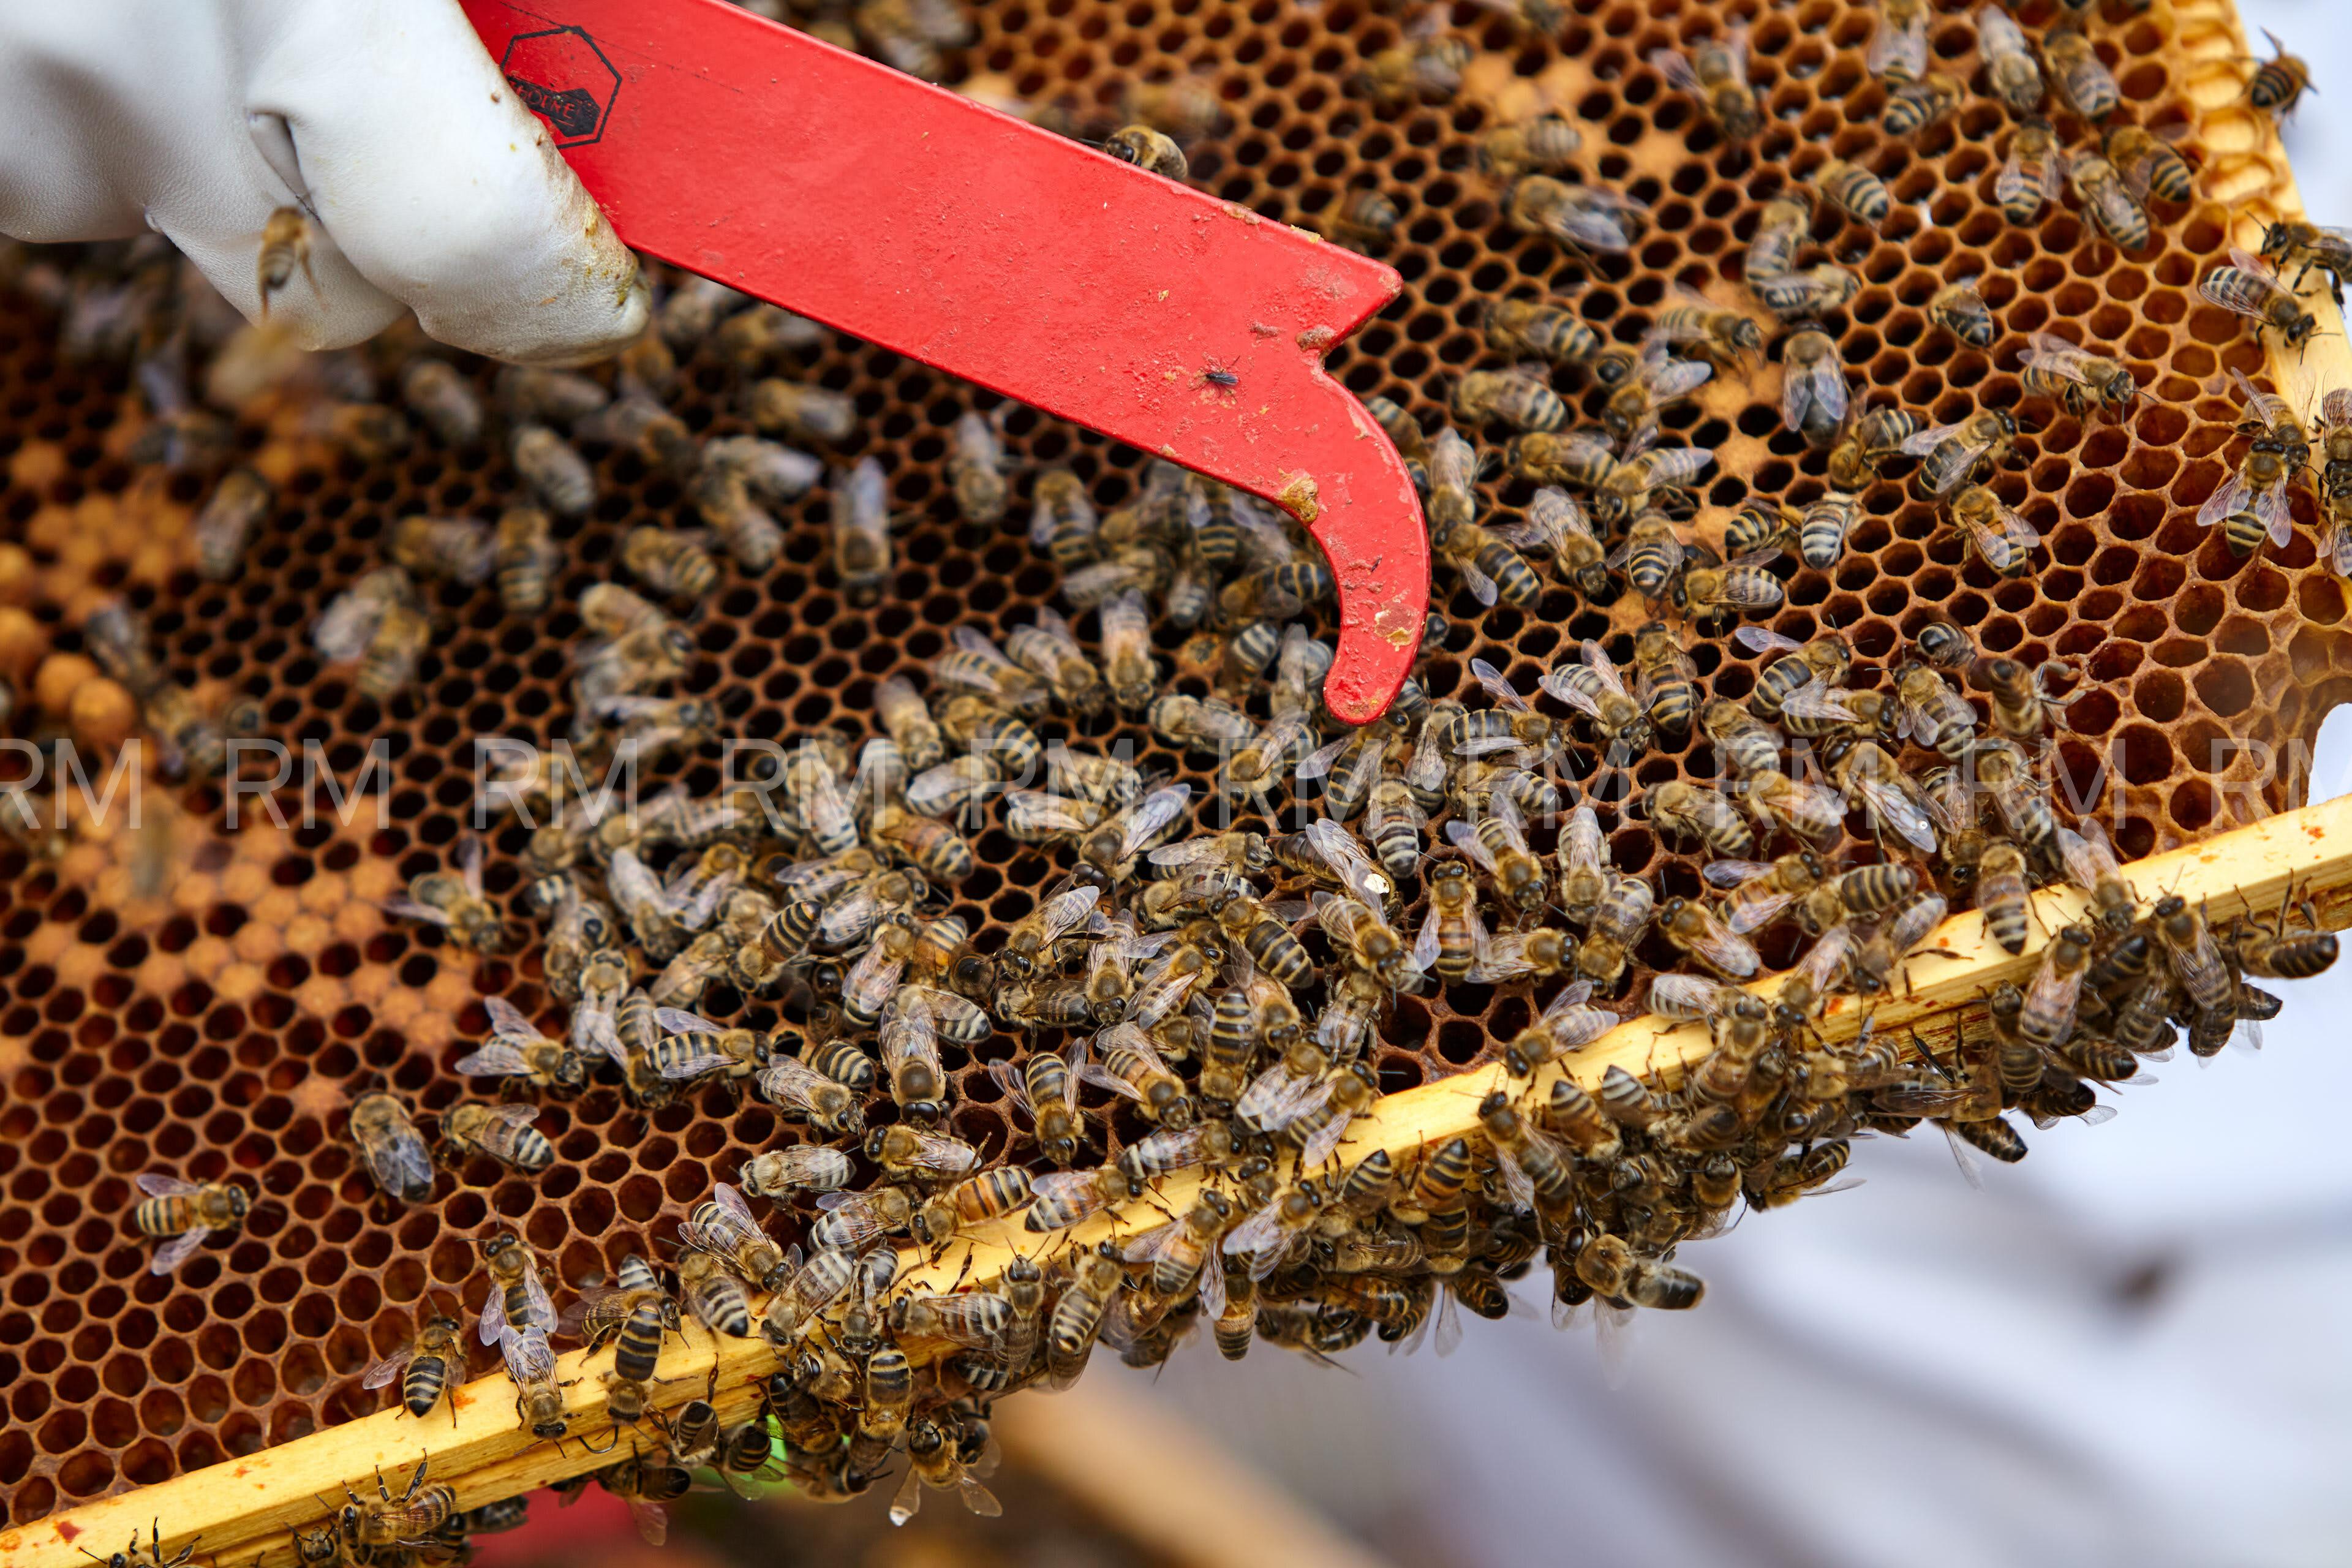 Richard Moran Bees 006